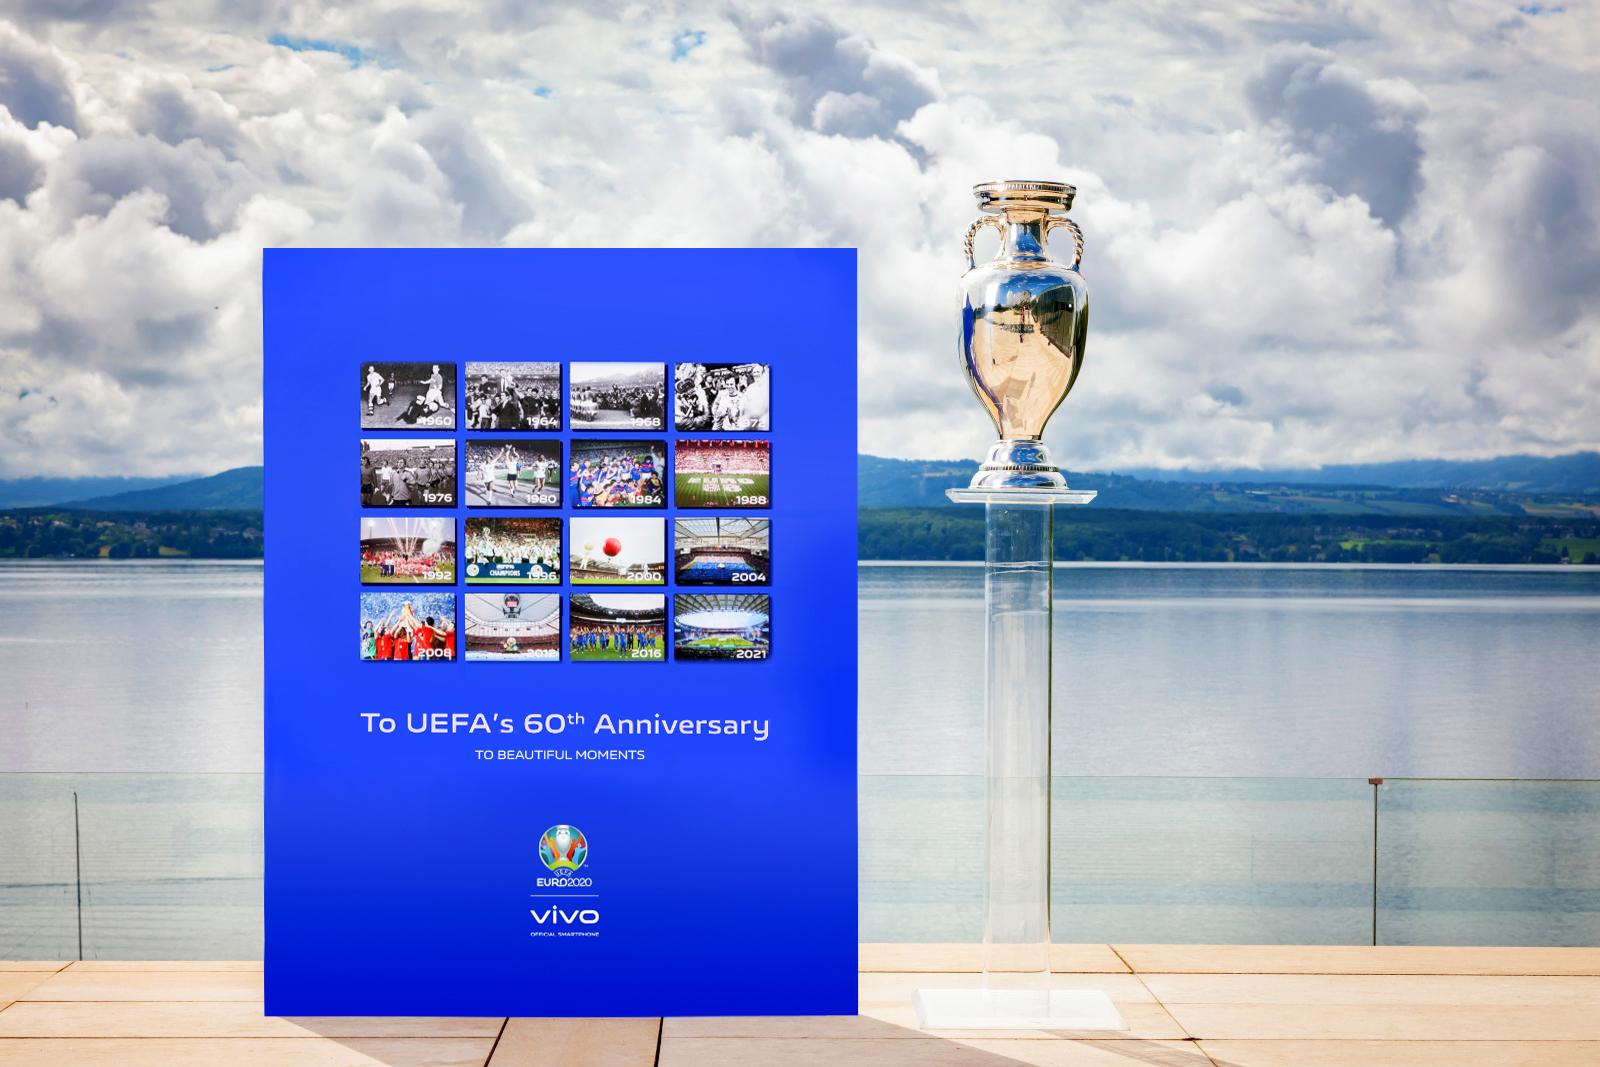 UEFA EURO 60th Anniversary – VIVO Backdrop